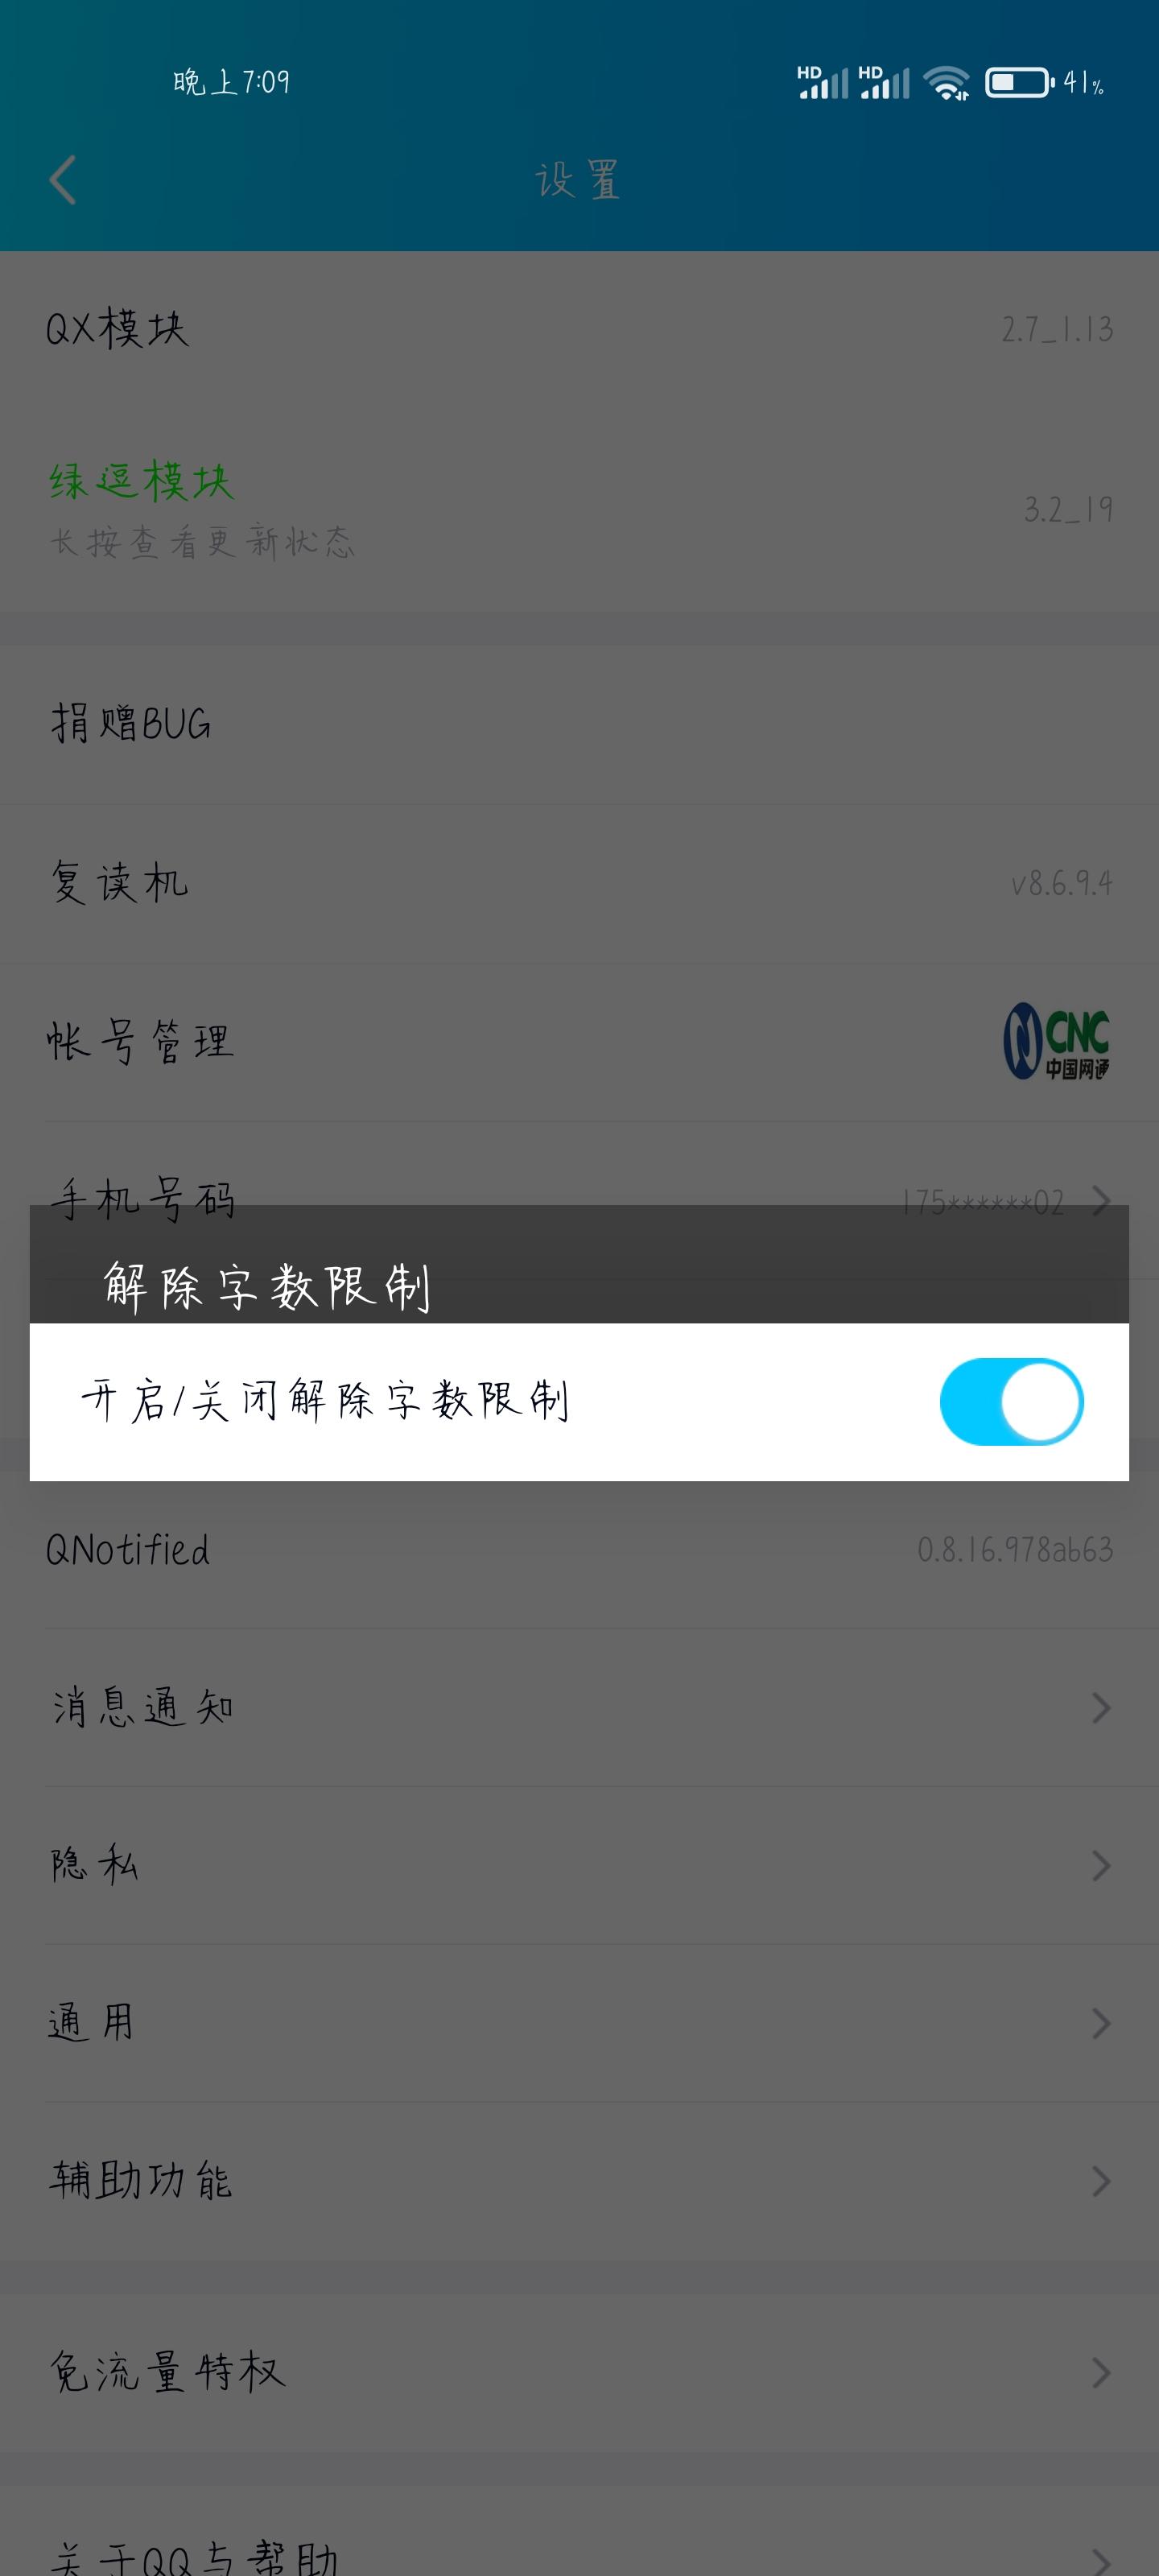 QQ复读机8.6.9.4修改免收费版